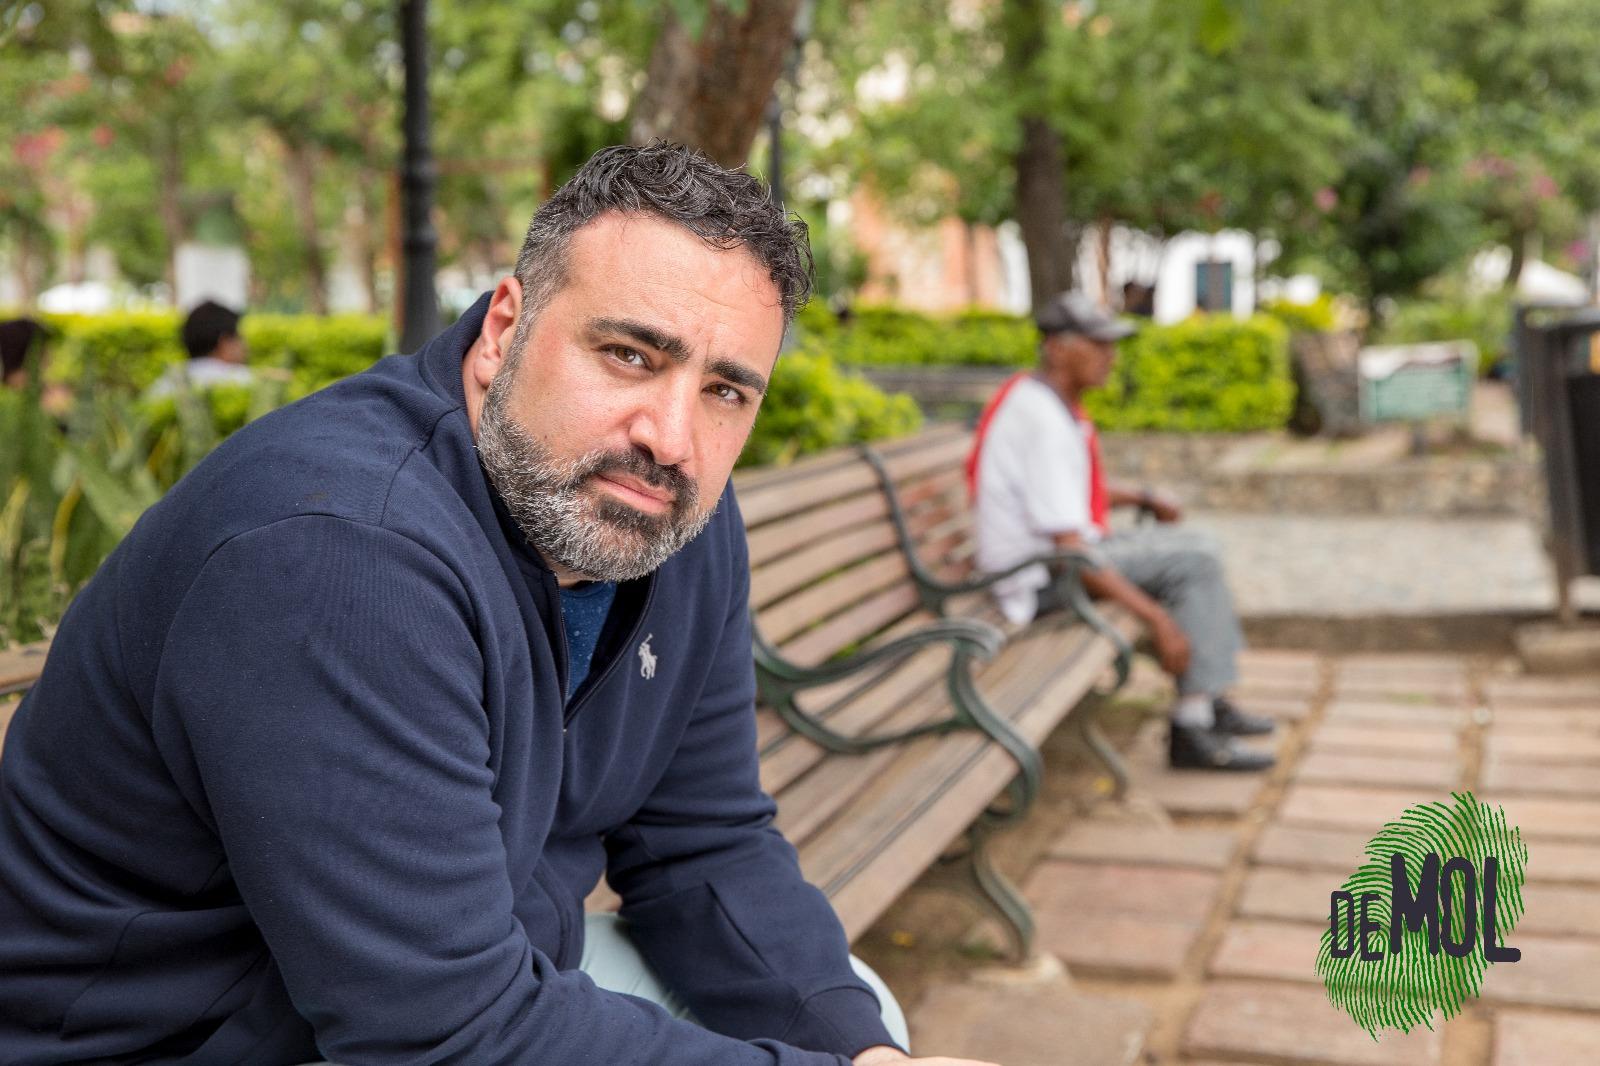 Livestream NAVB met documentairemaker Sinan Can